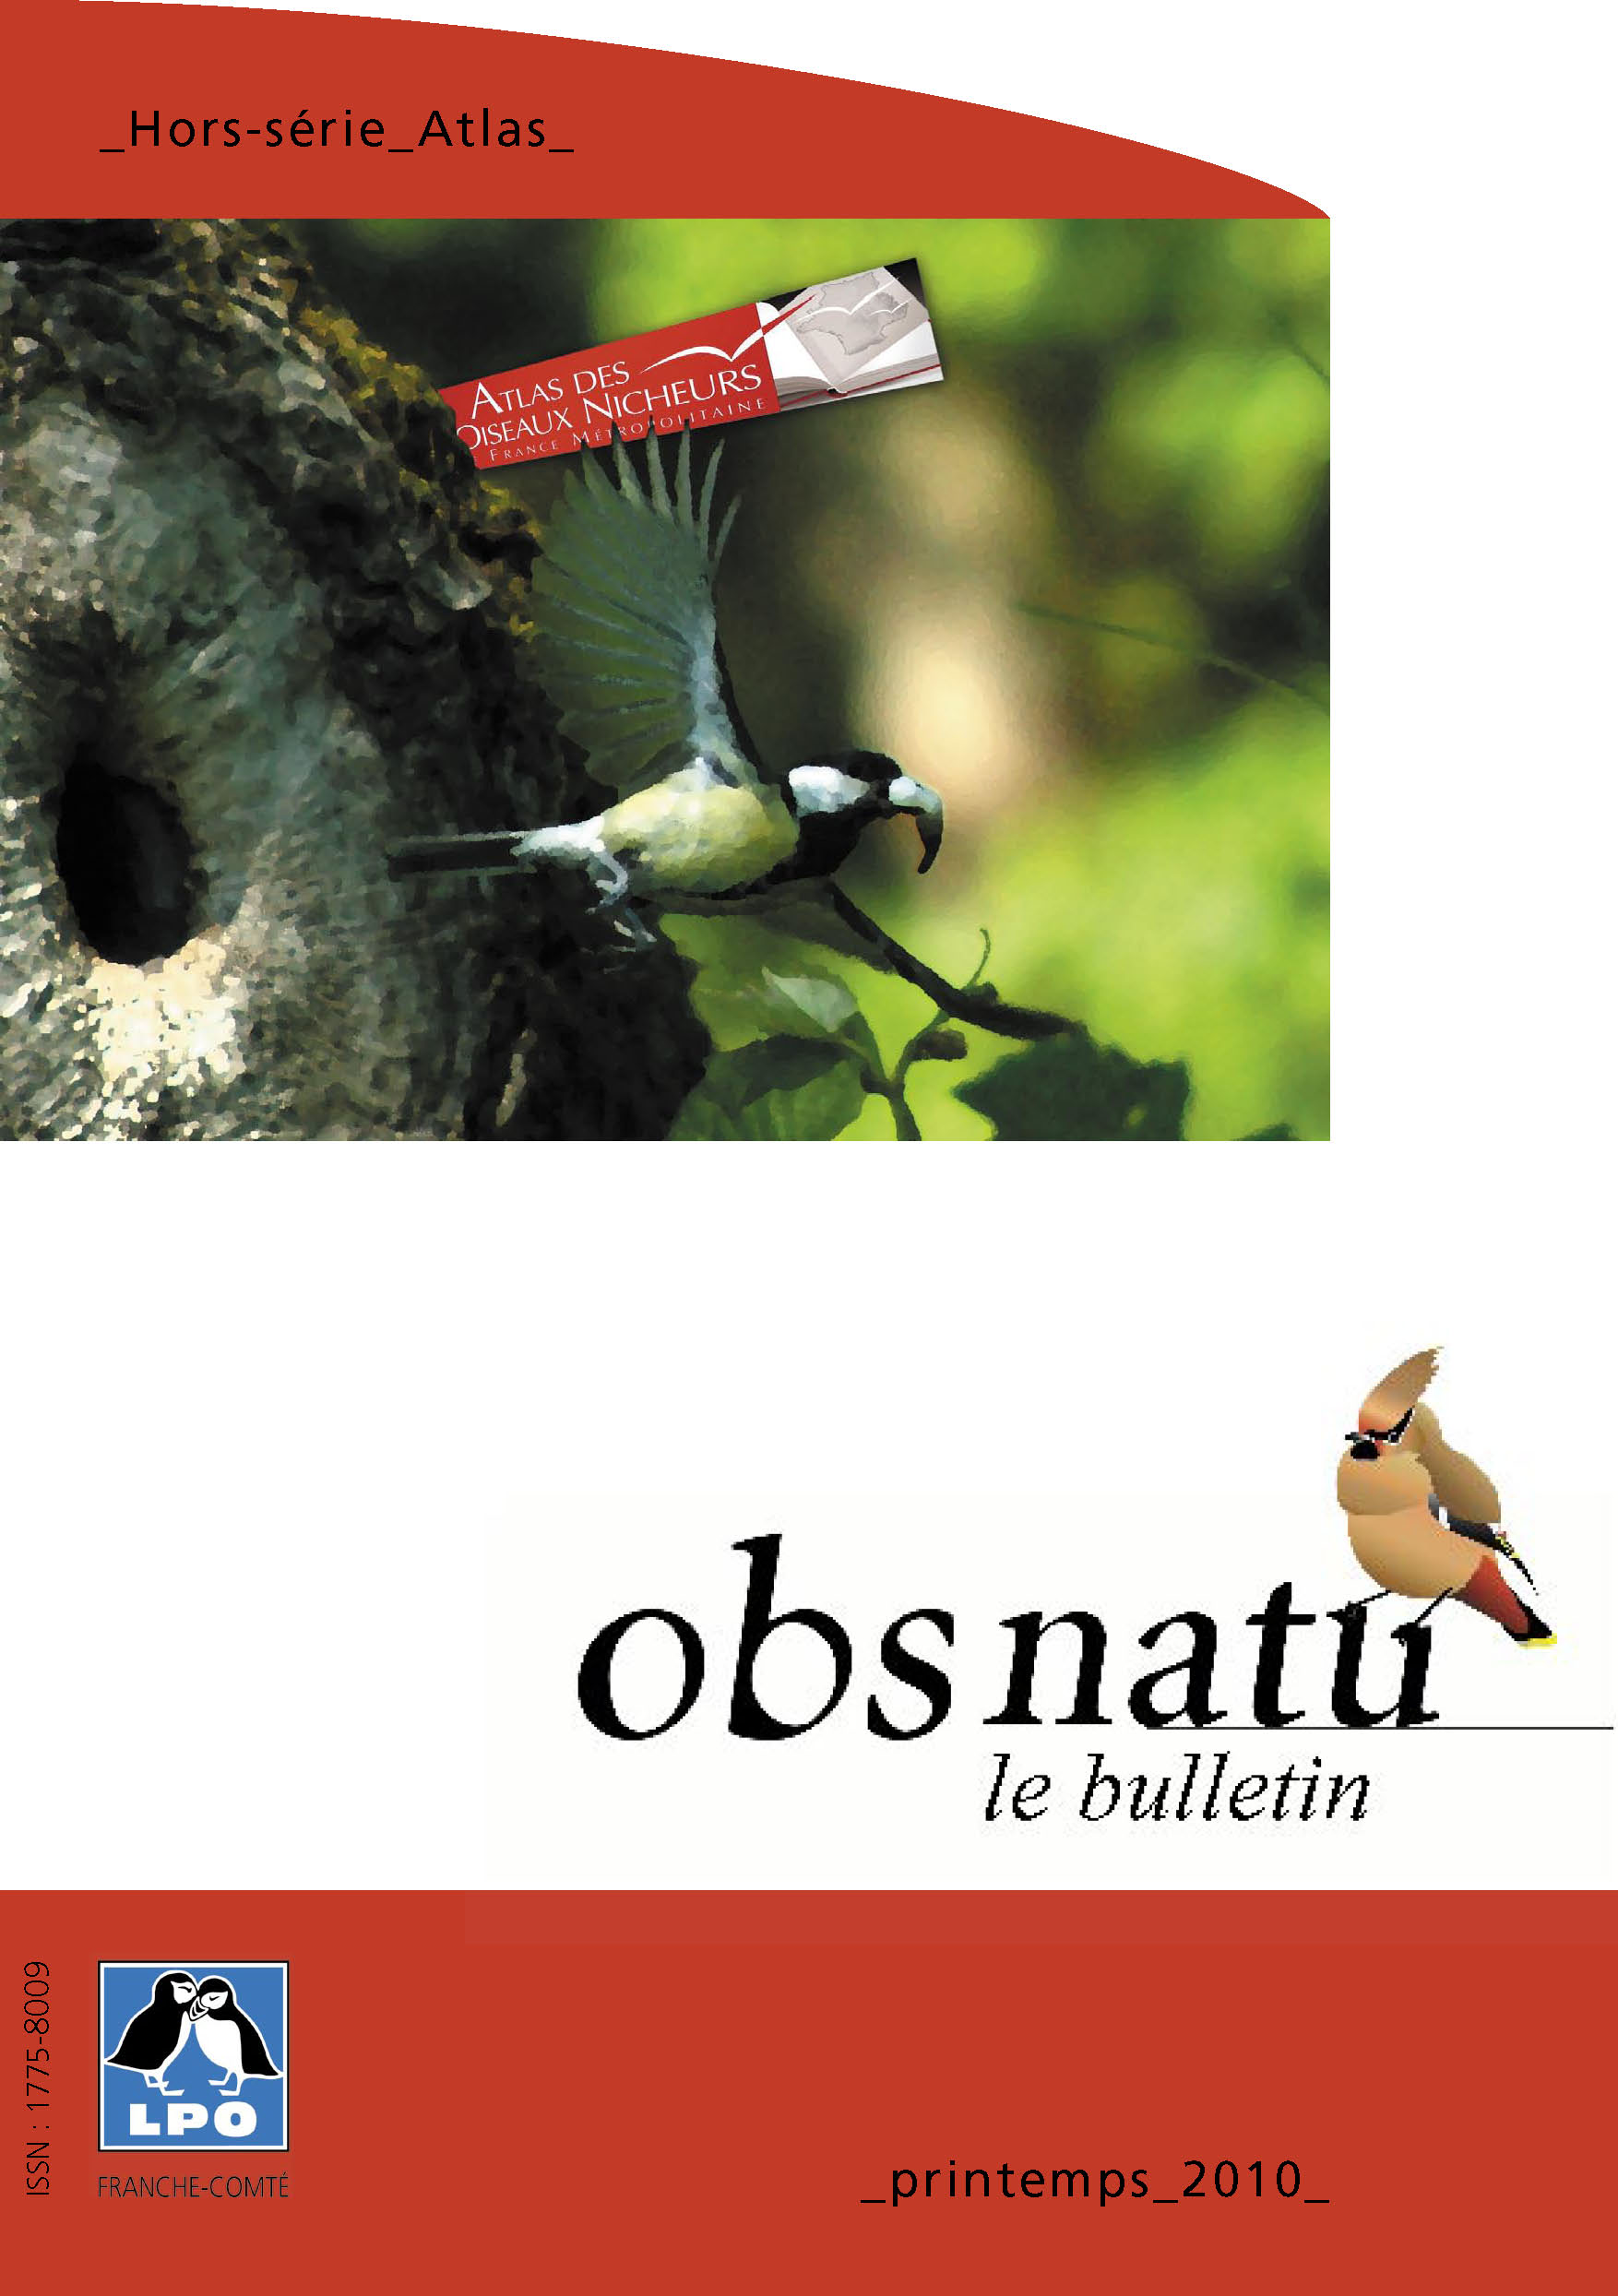 https://cdnfiles2.biolovision.net/franche-comte.lpo.fr/userfiles/publications/ObsnatuHSAtlasPage01.jpg